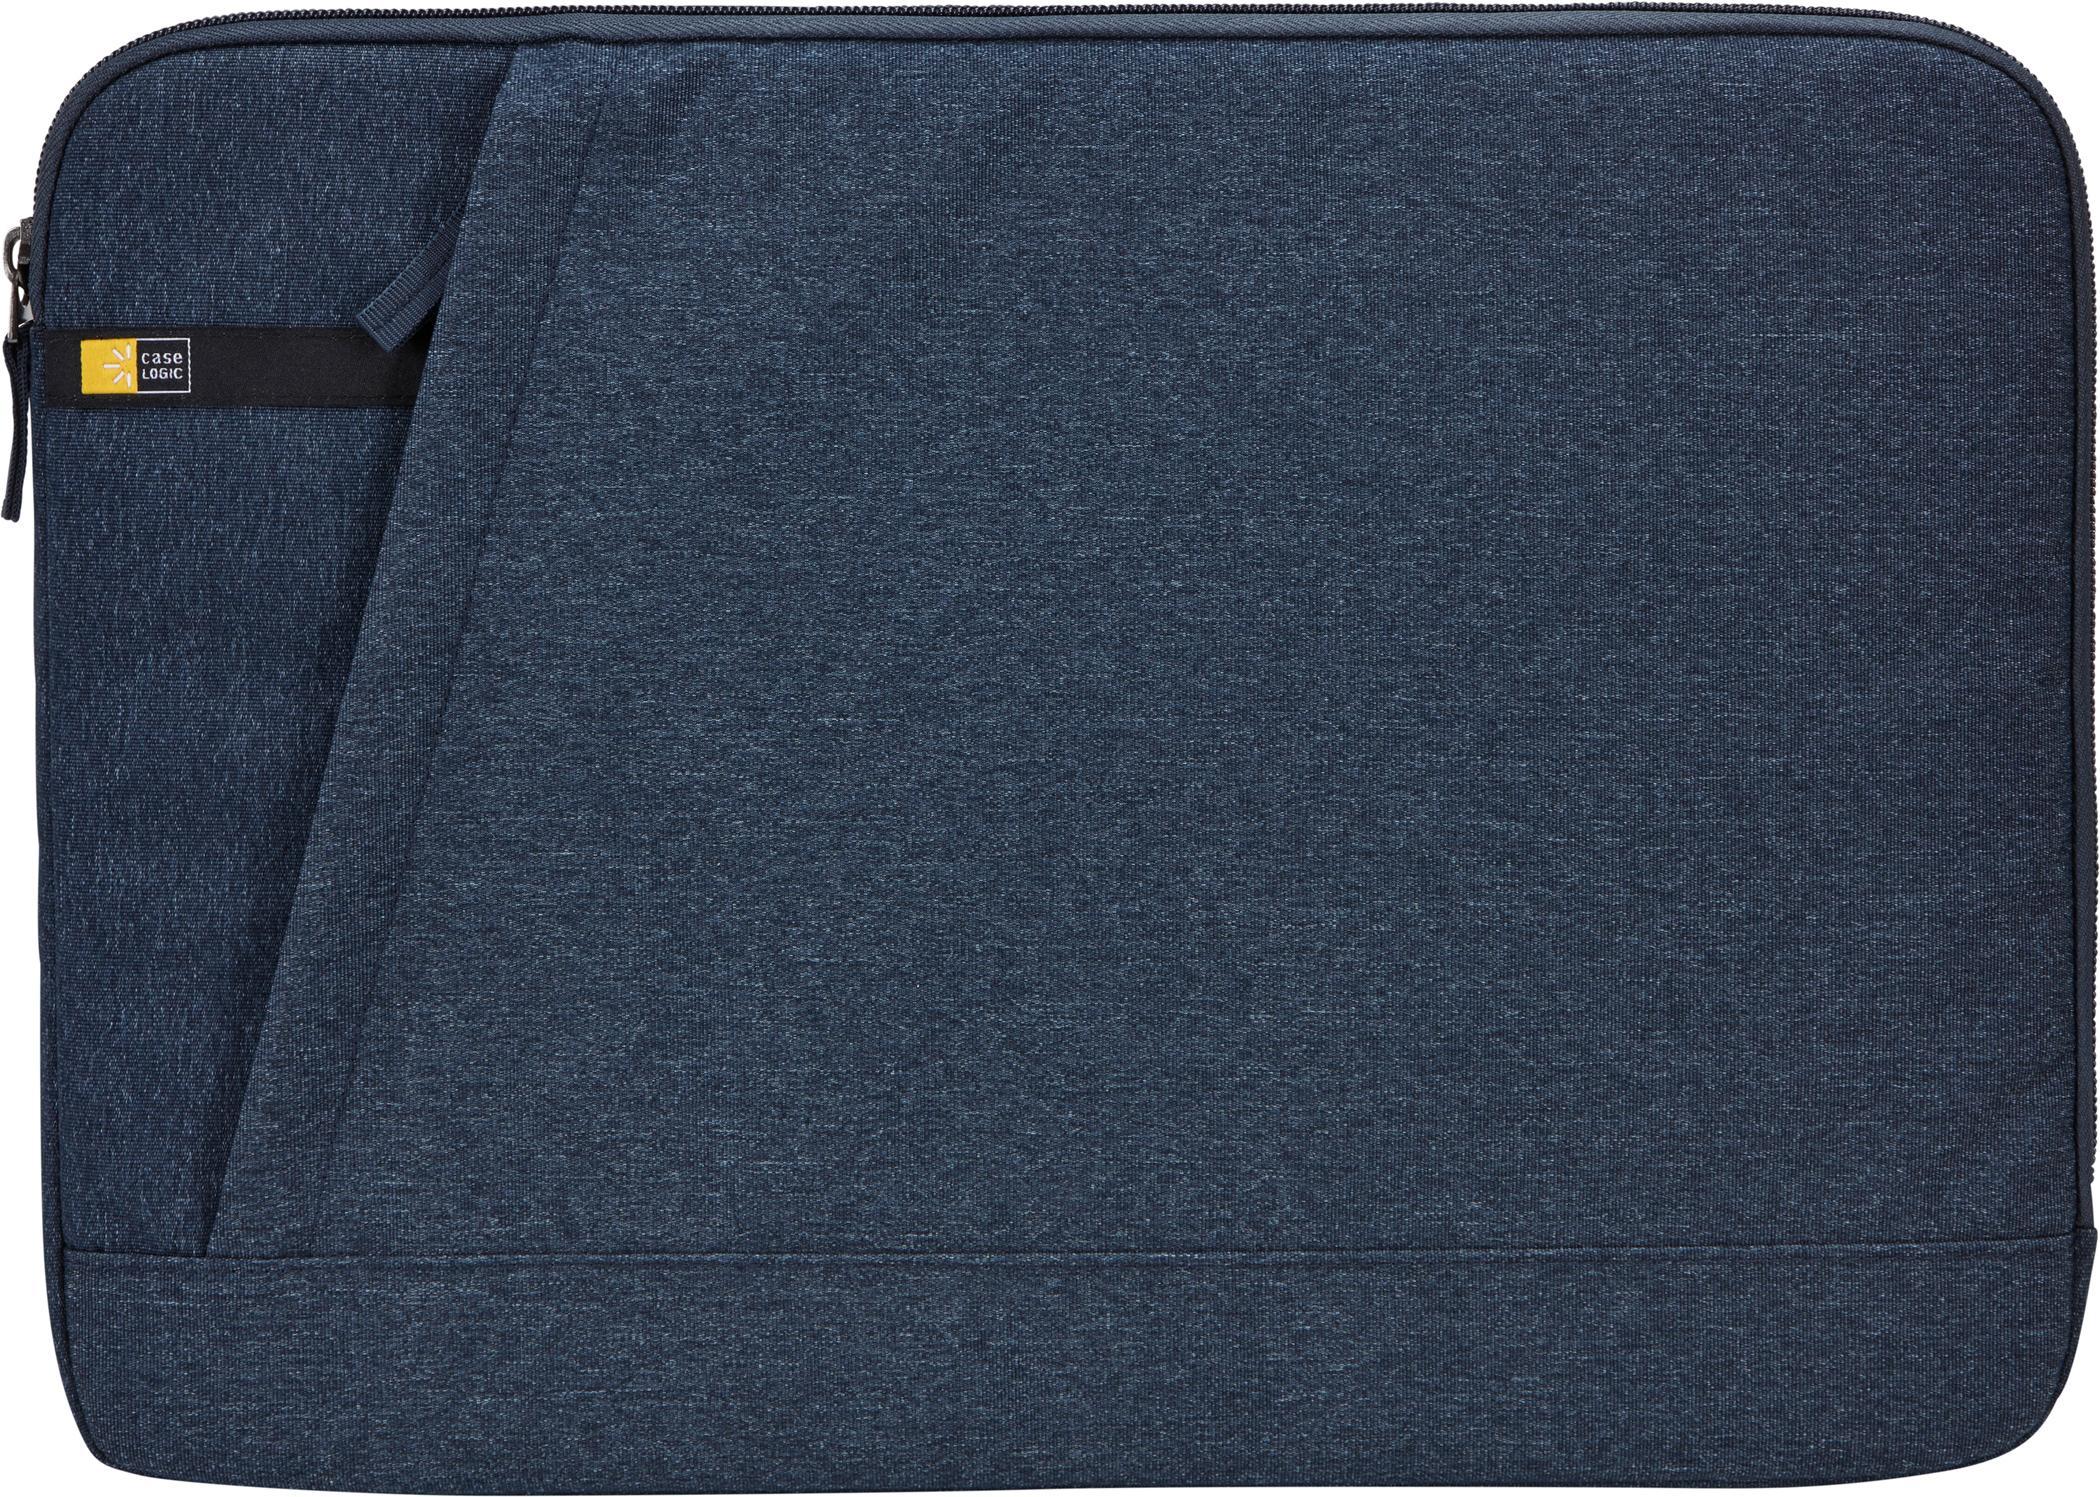 dafe01e4b35 Case Logic Huxton 15,6-laptopsleeve (HUXS115B) kopen » Centralpoint